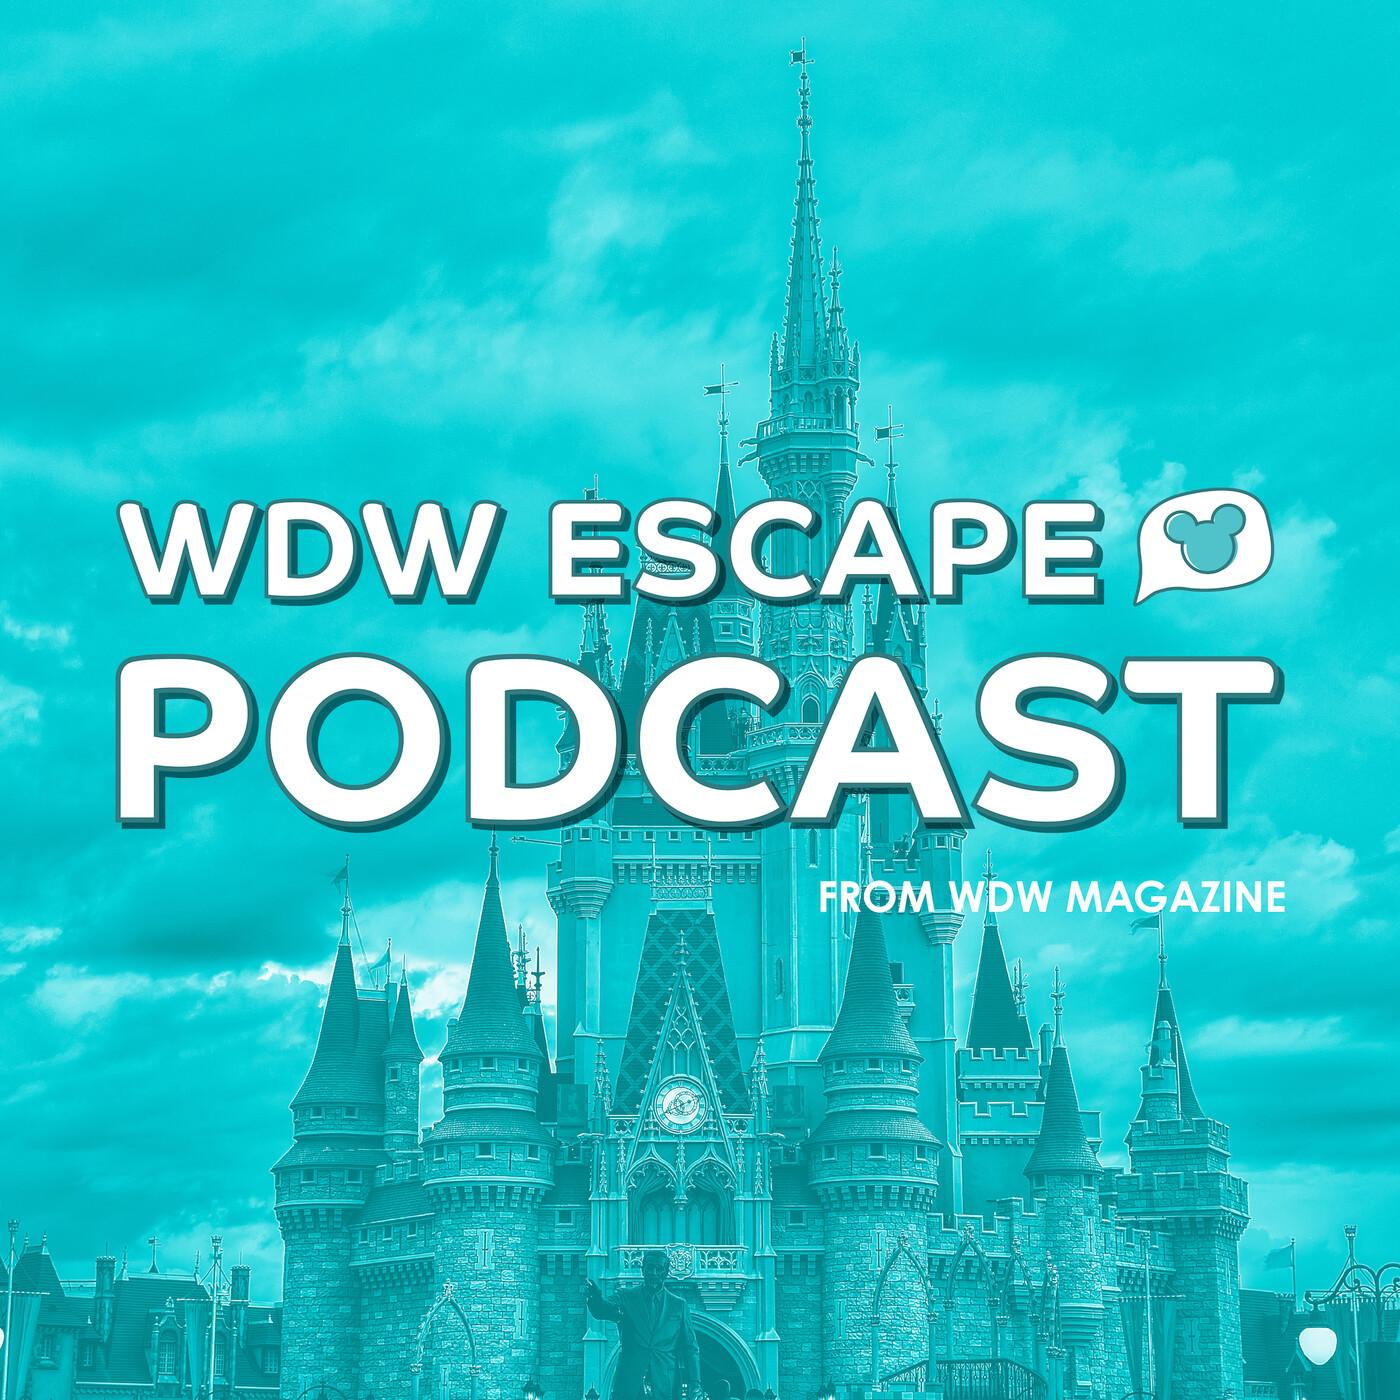 WDW Escape 25 - Imagine Fantasyland